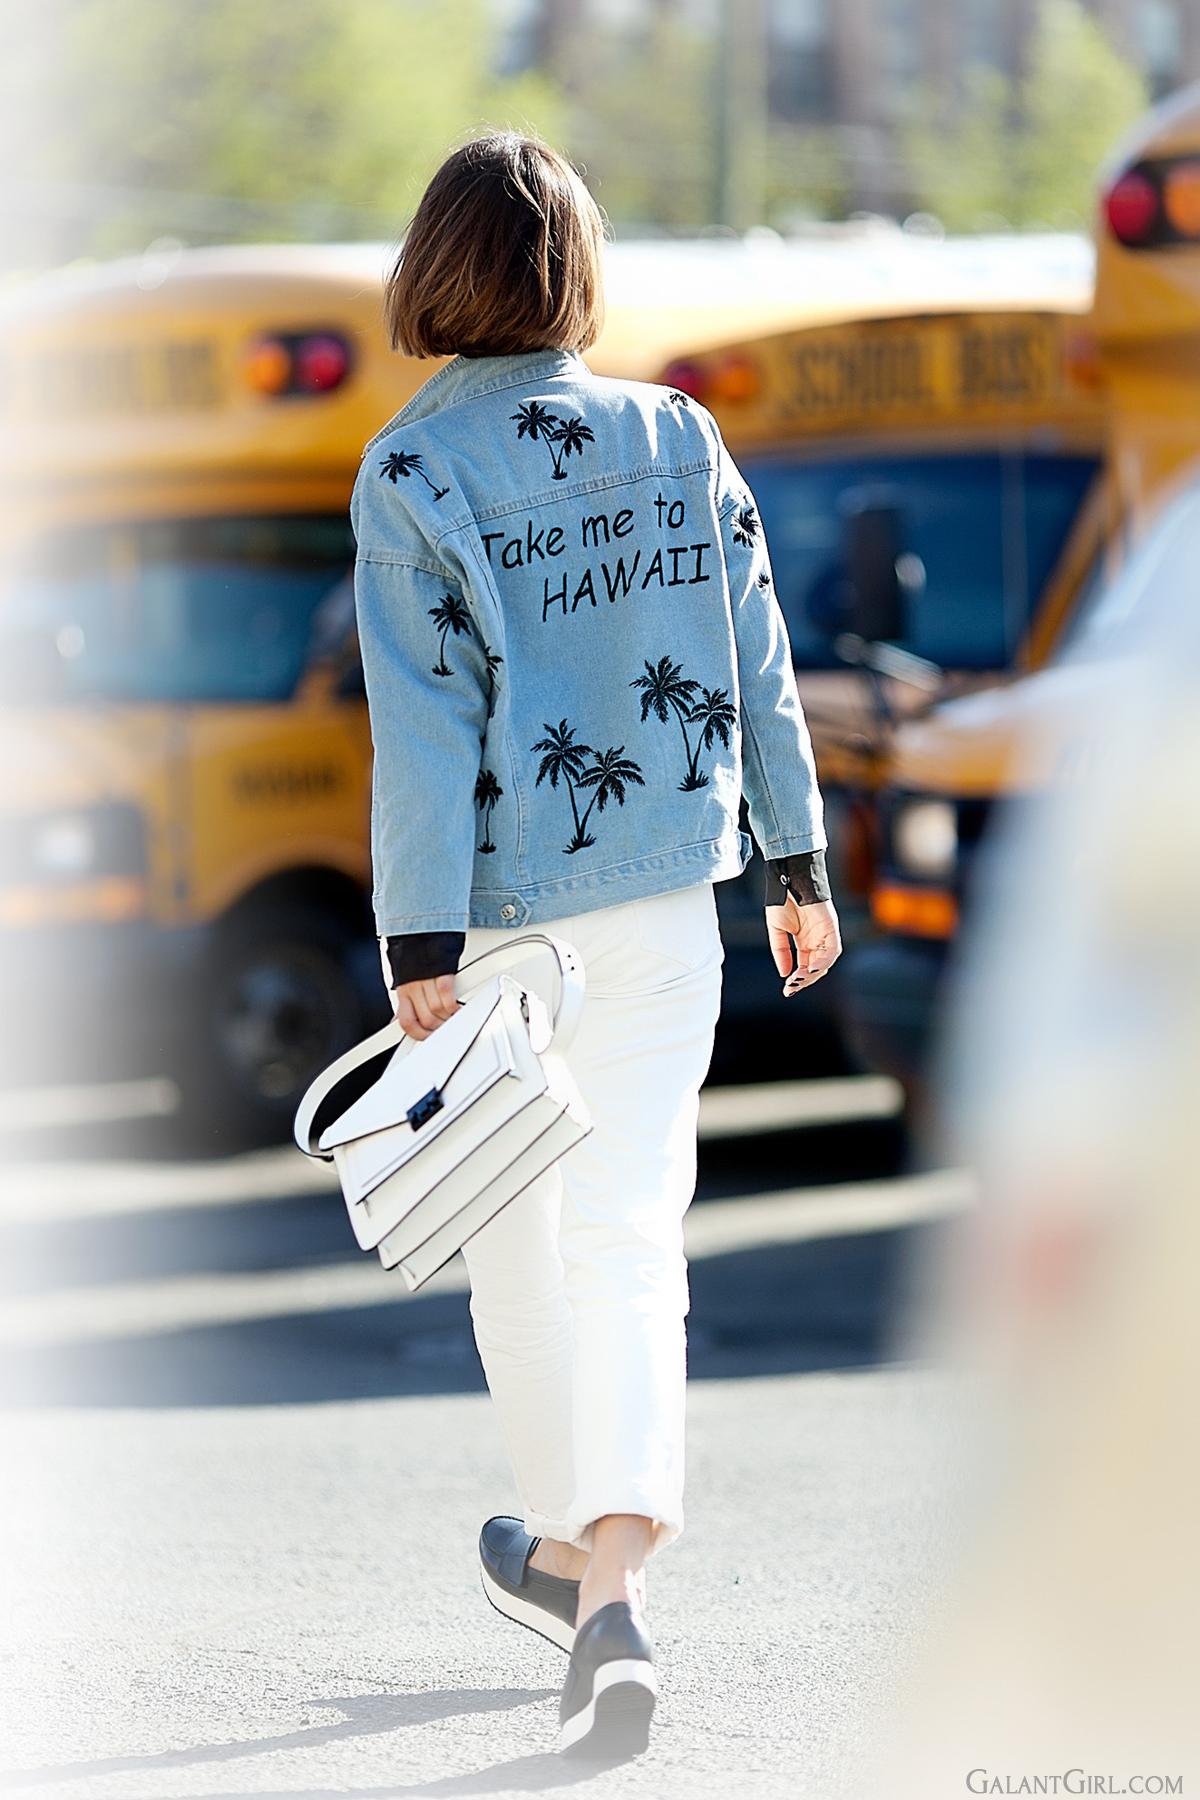 take me to Hawaii denim jacket, Heart Beats Vintage denim Jacket, street style fashion, street style blog on GalantGirl.com